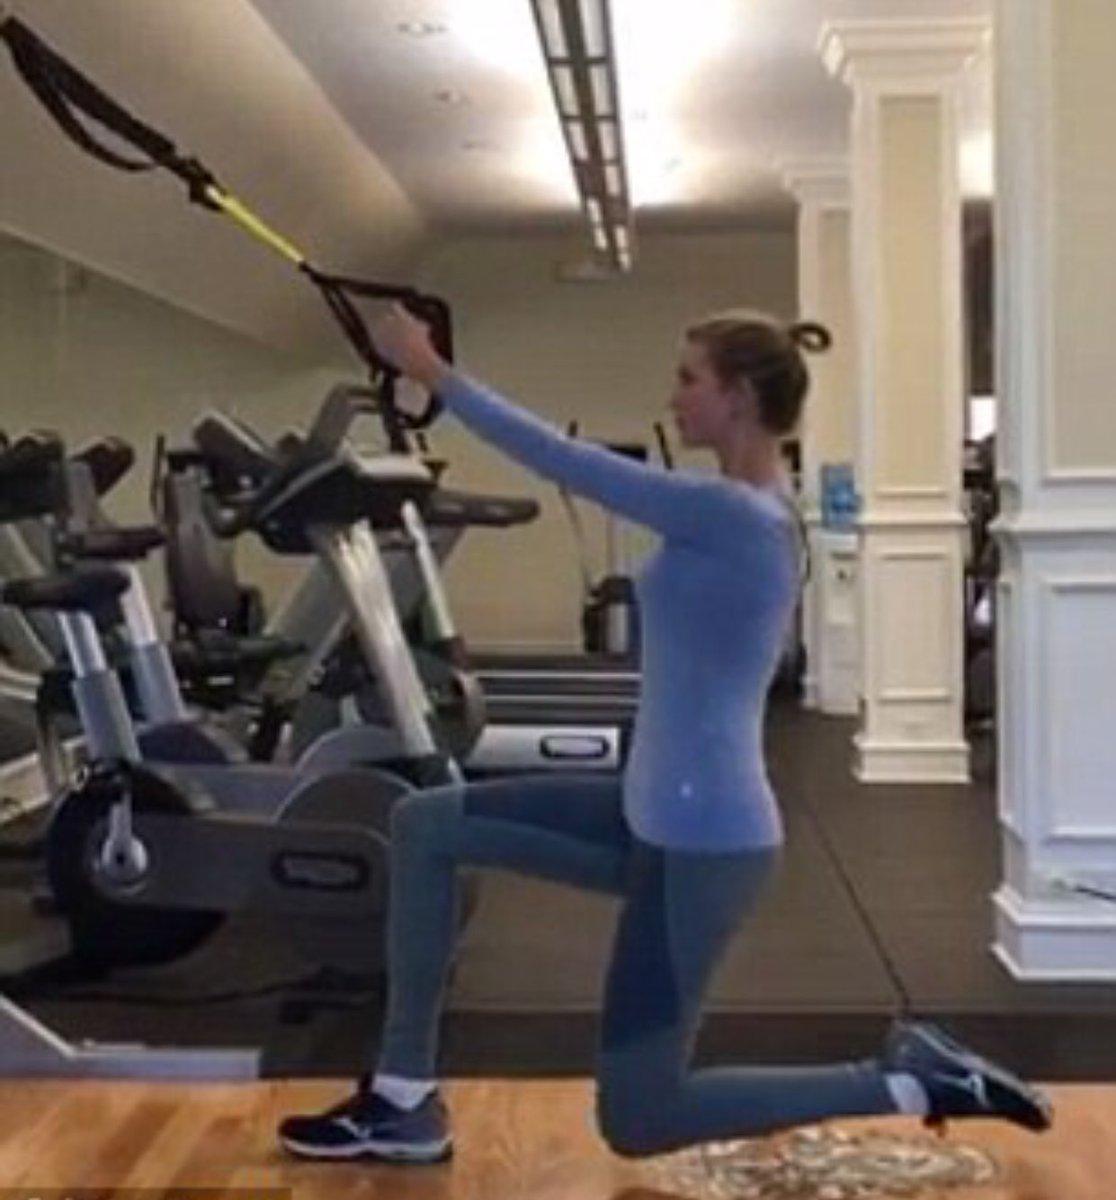 Ivanka working hard in the gym.